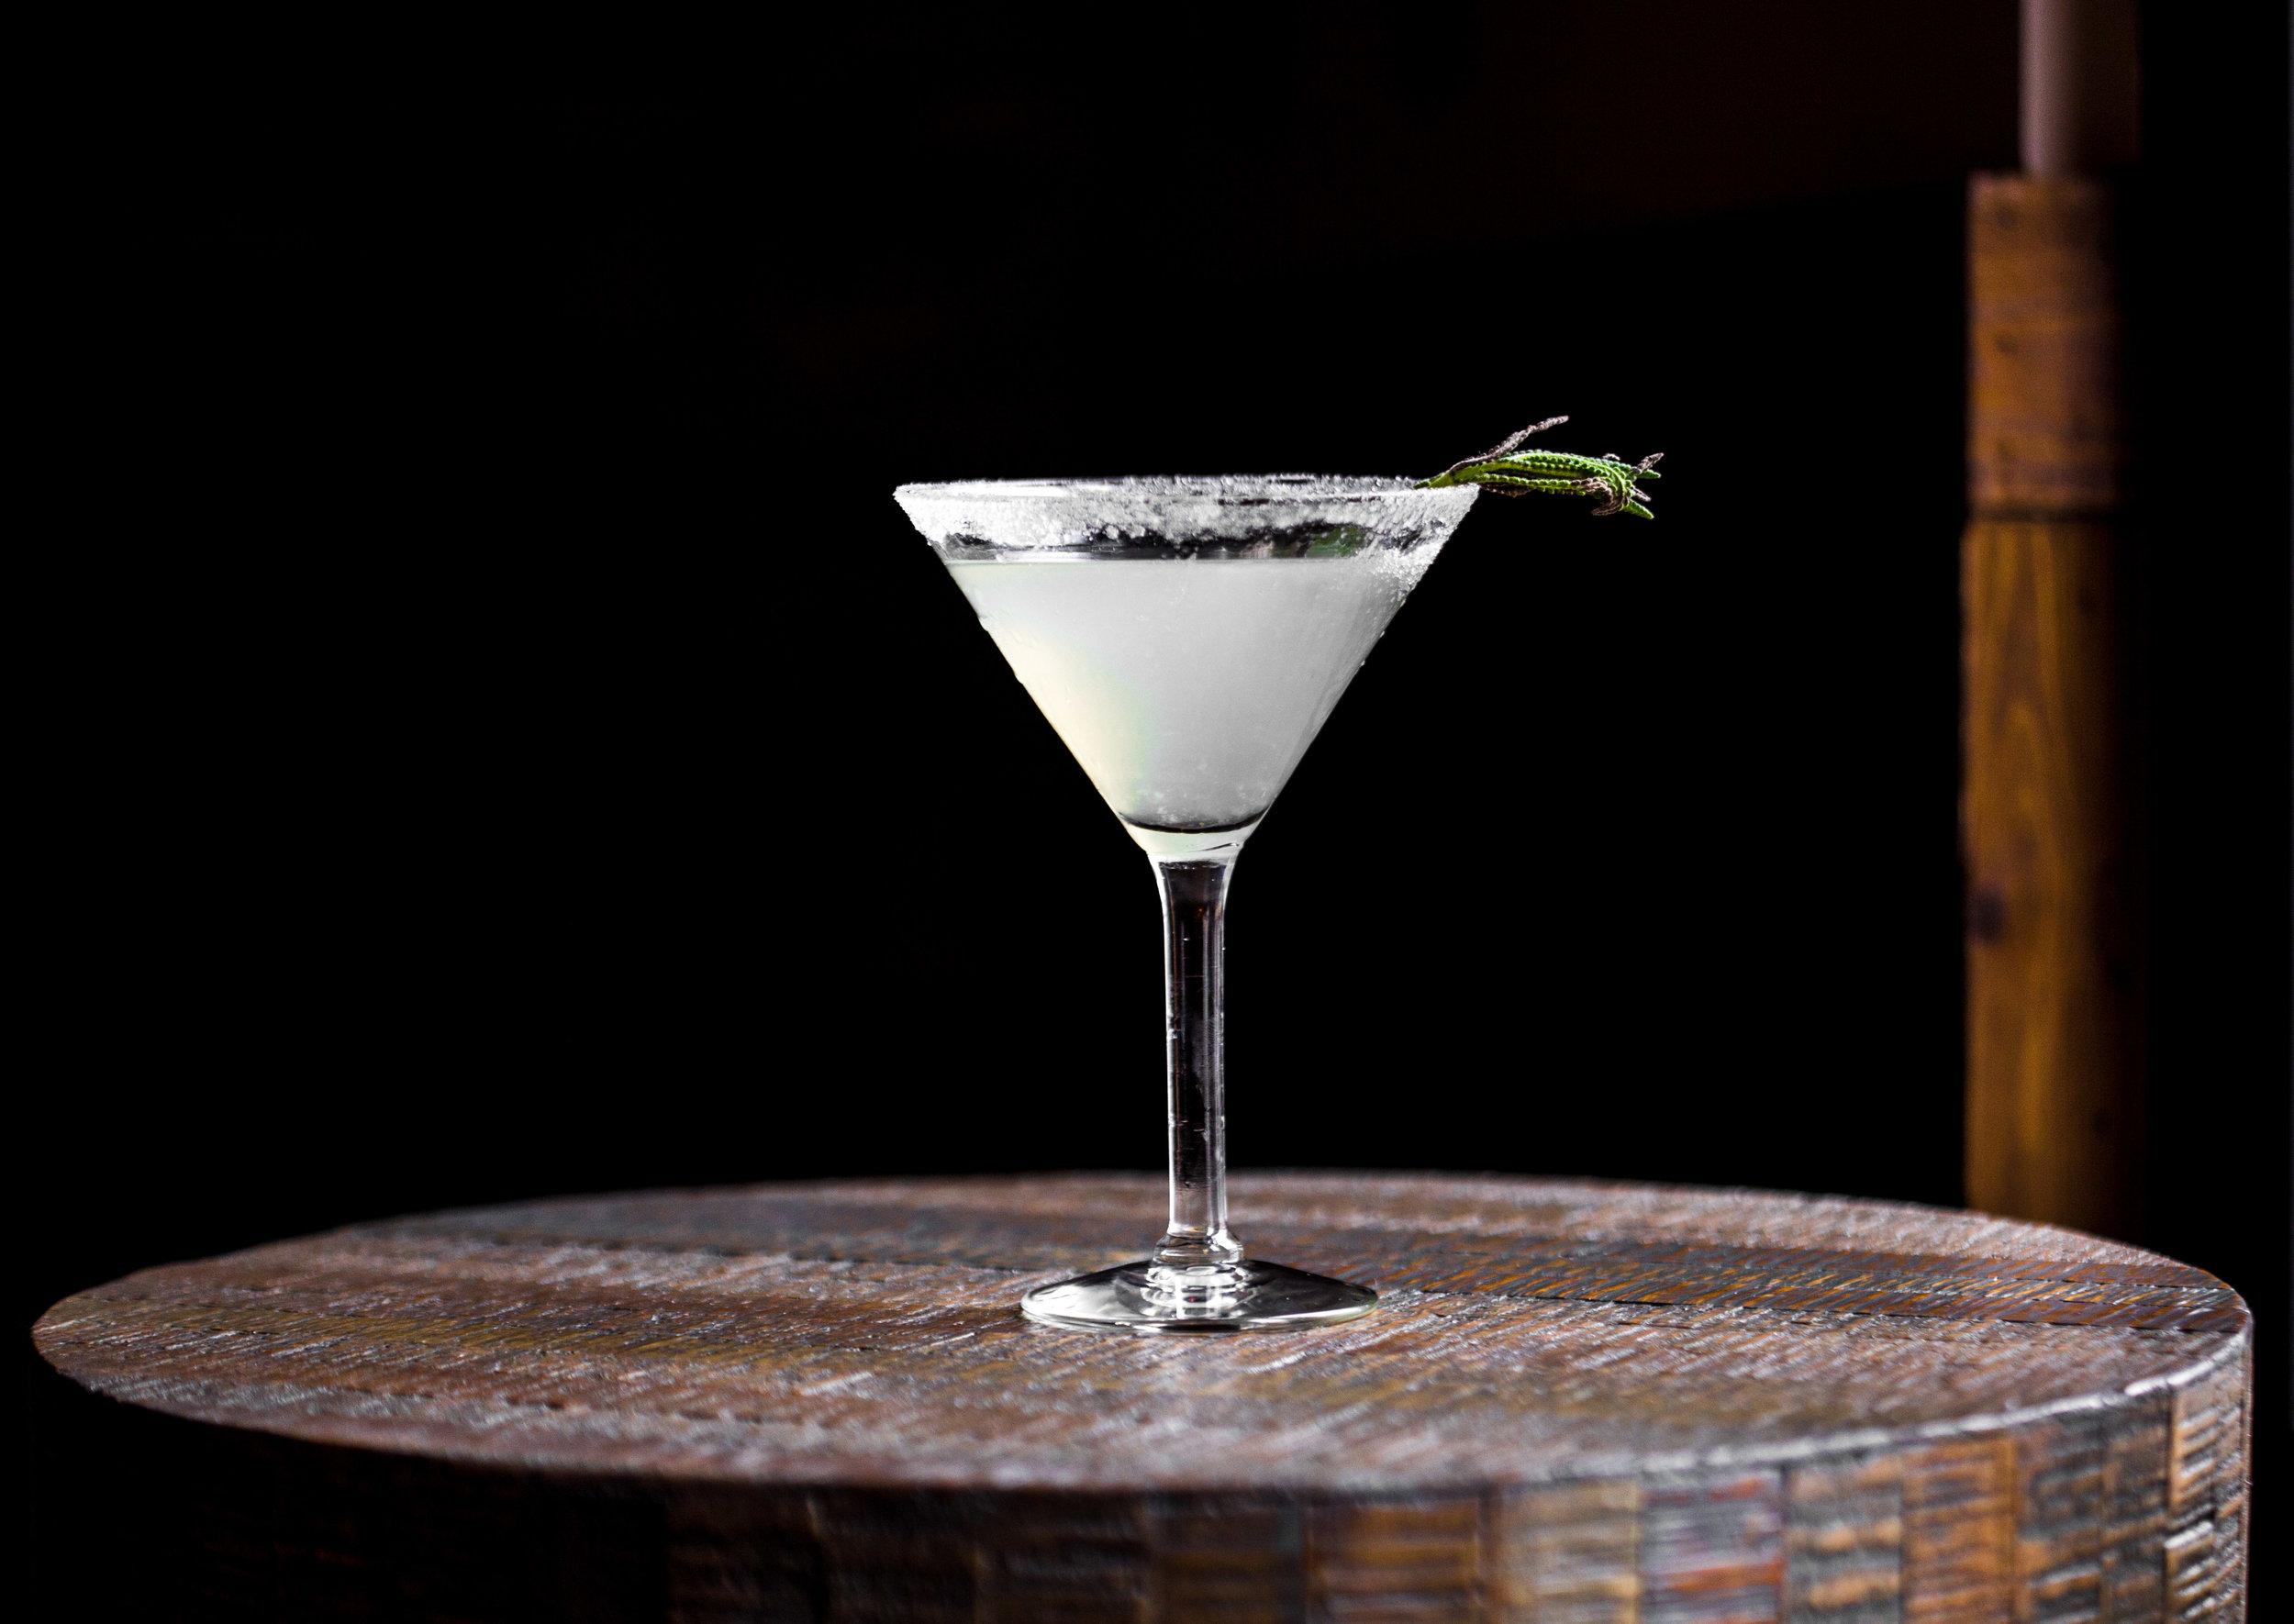 Cocktails at O'Dowd's Gastrobar in Kansas City